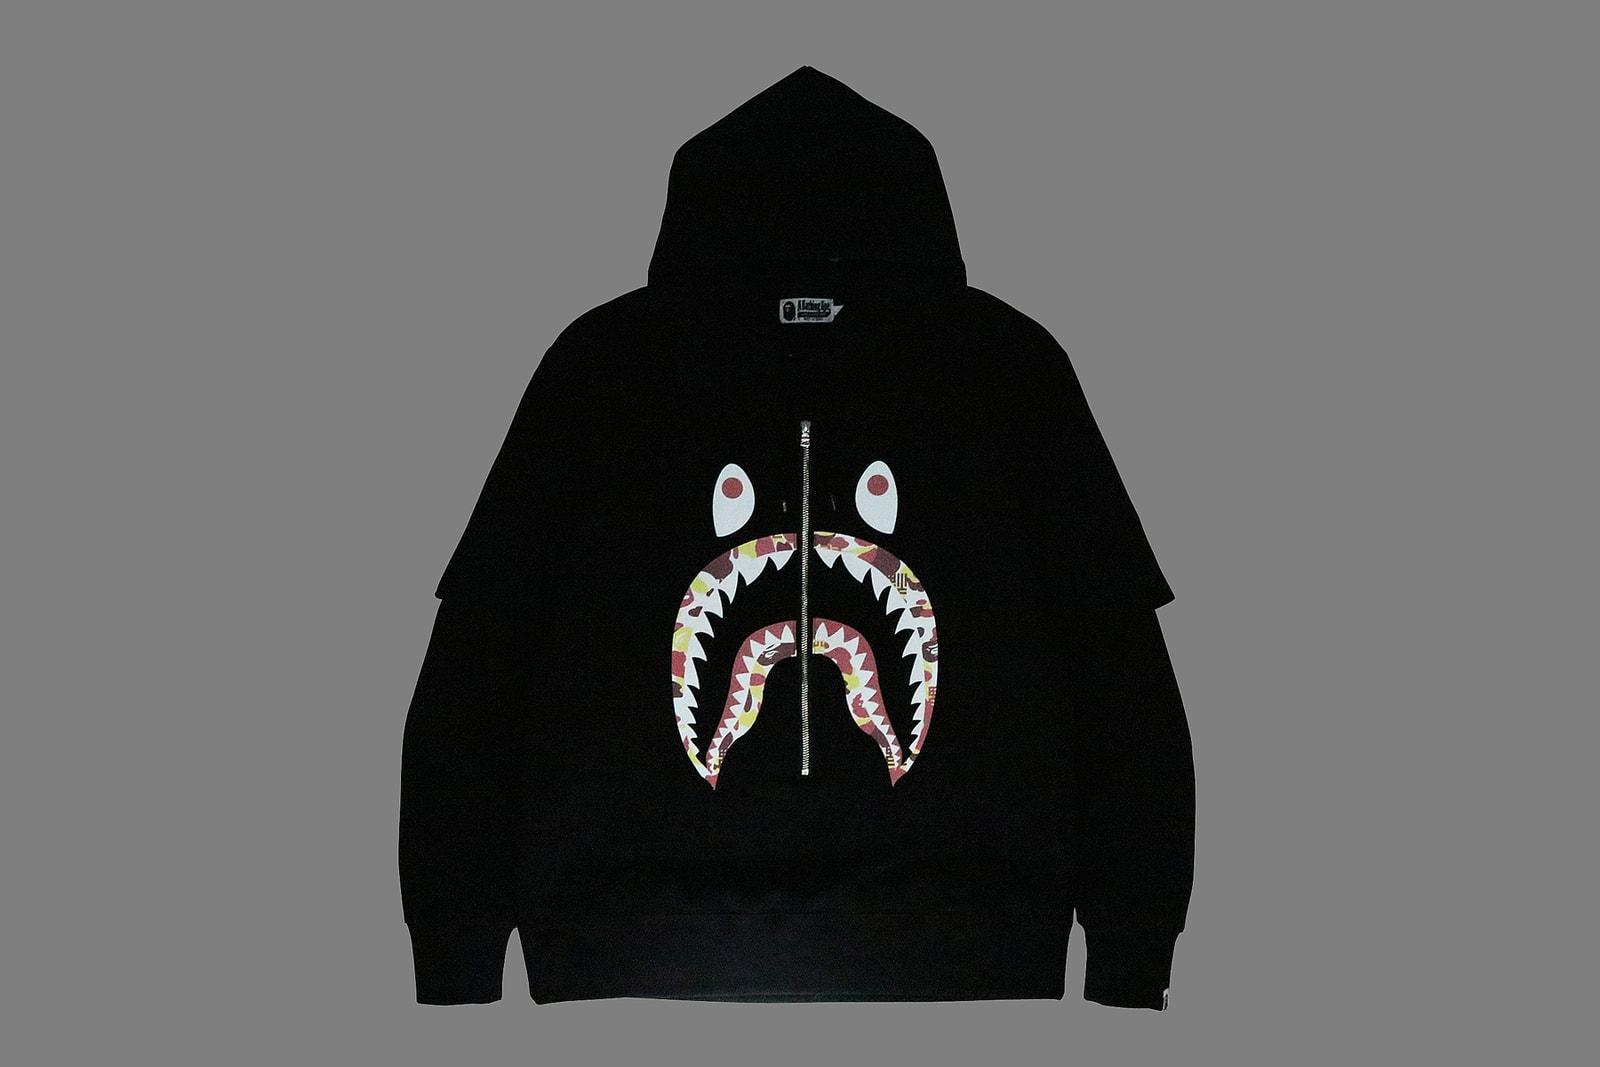 BAPE China 9th Anniversary Capsule a bathing ape shark hoodies red yellow abc camo print ape head bags accessories